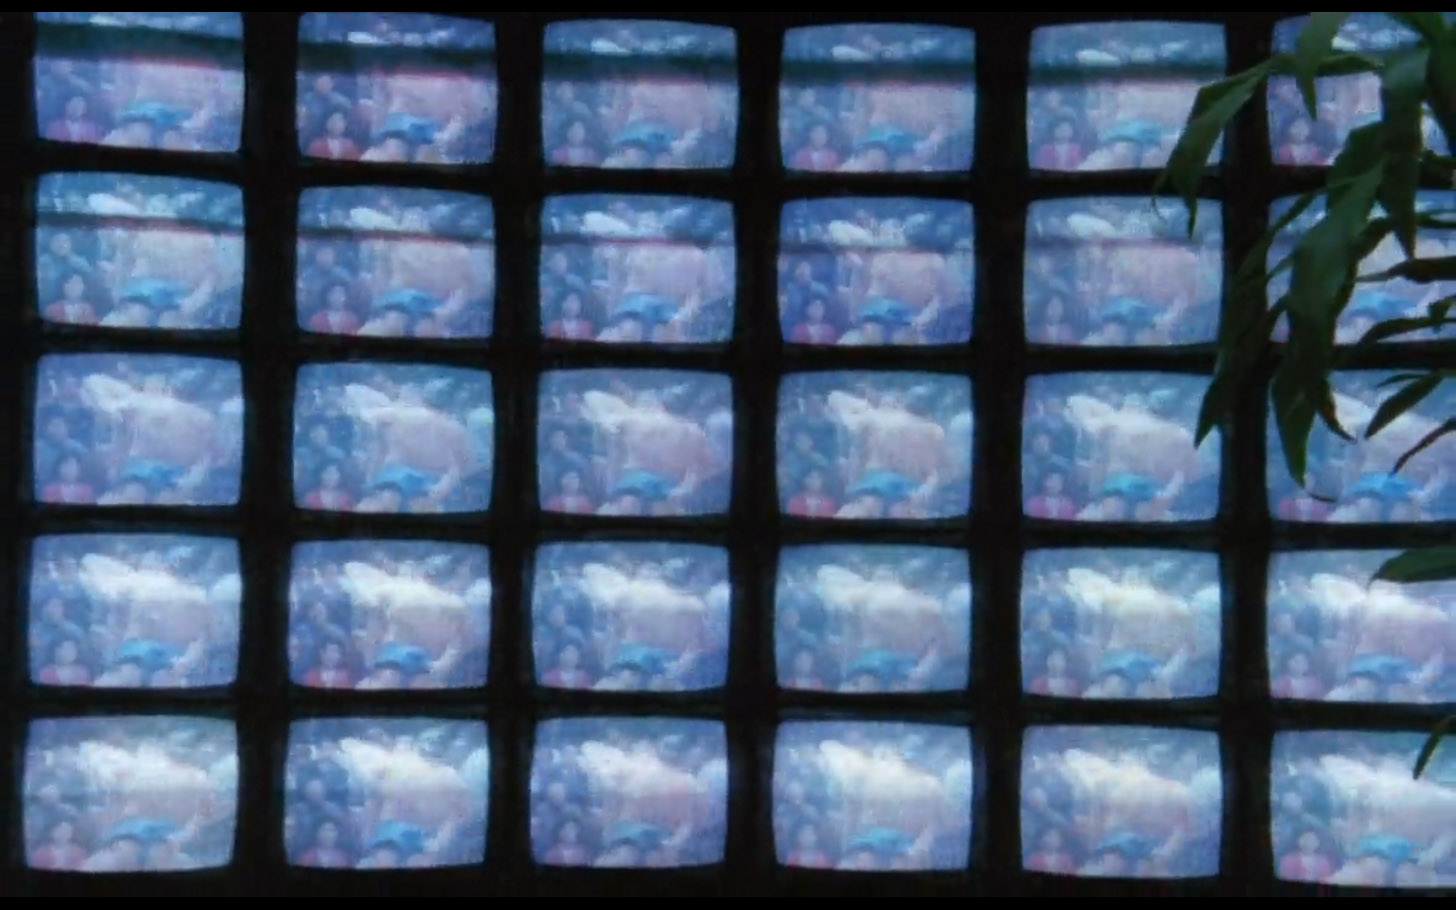 sans-soleil-1983-15.jpg